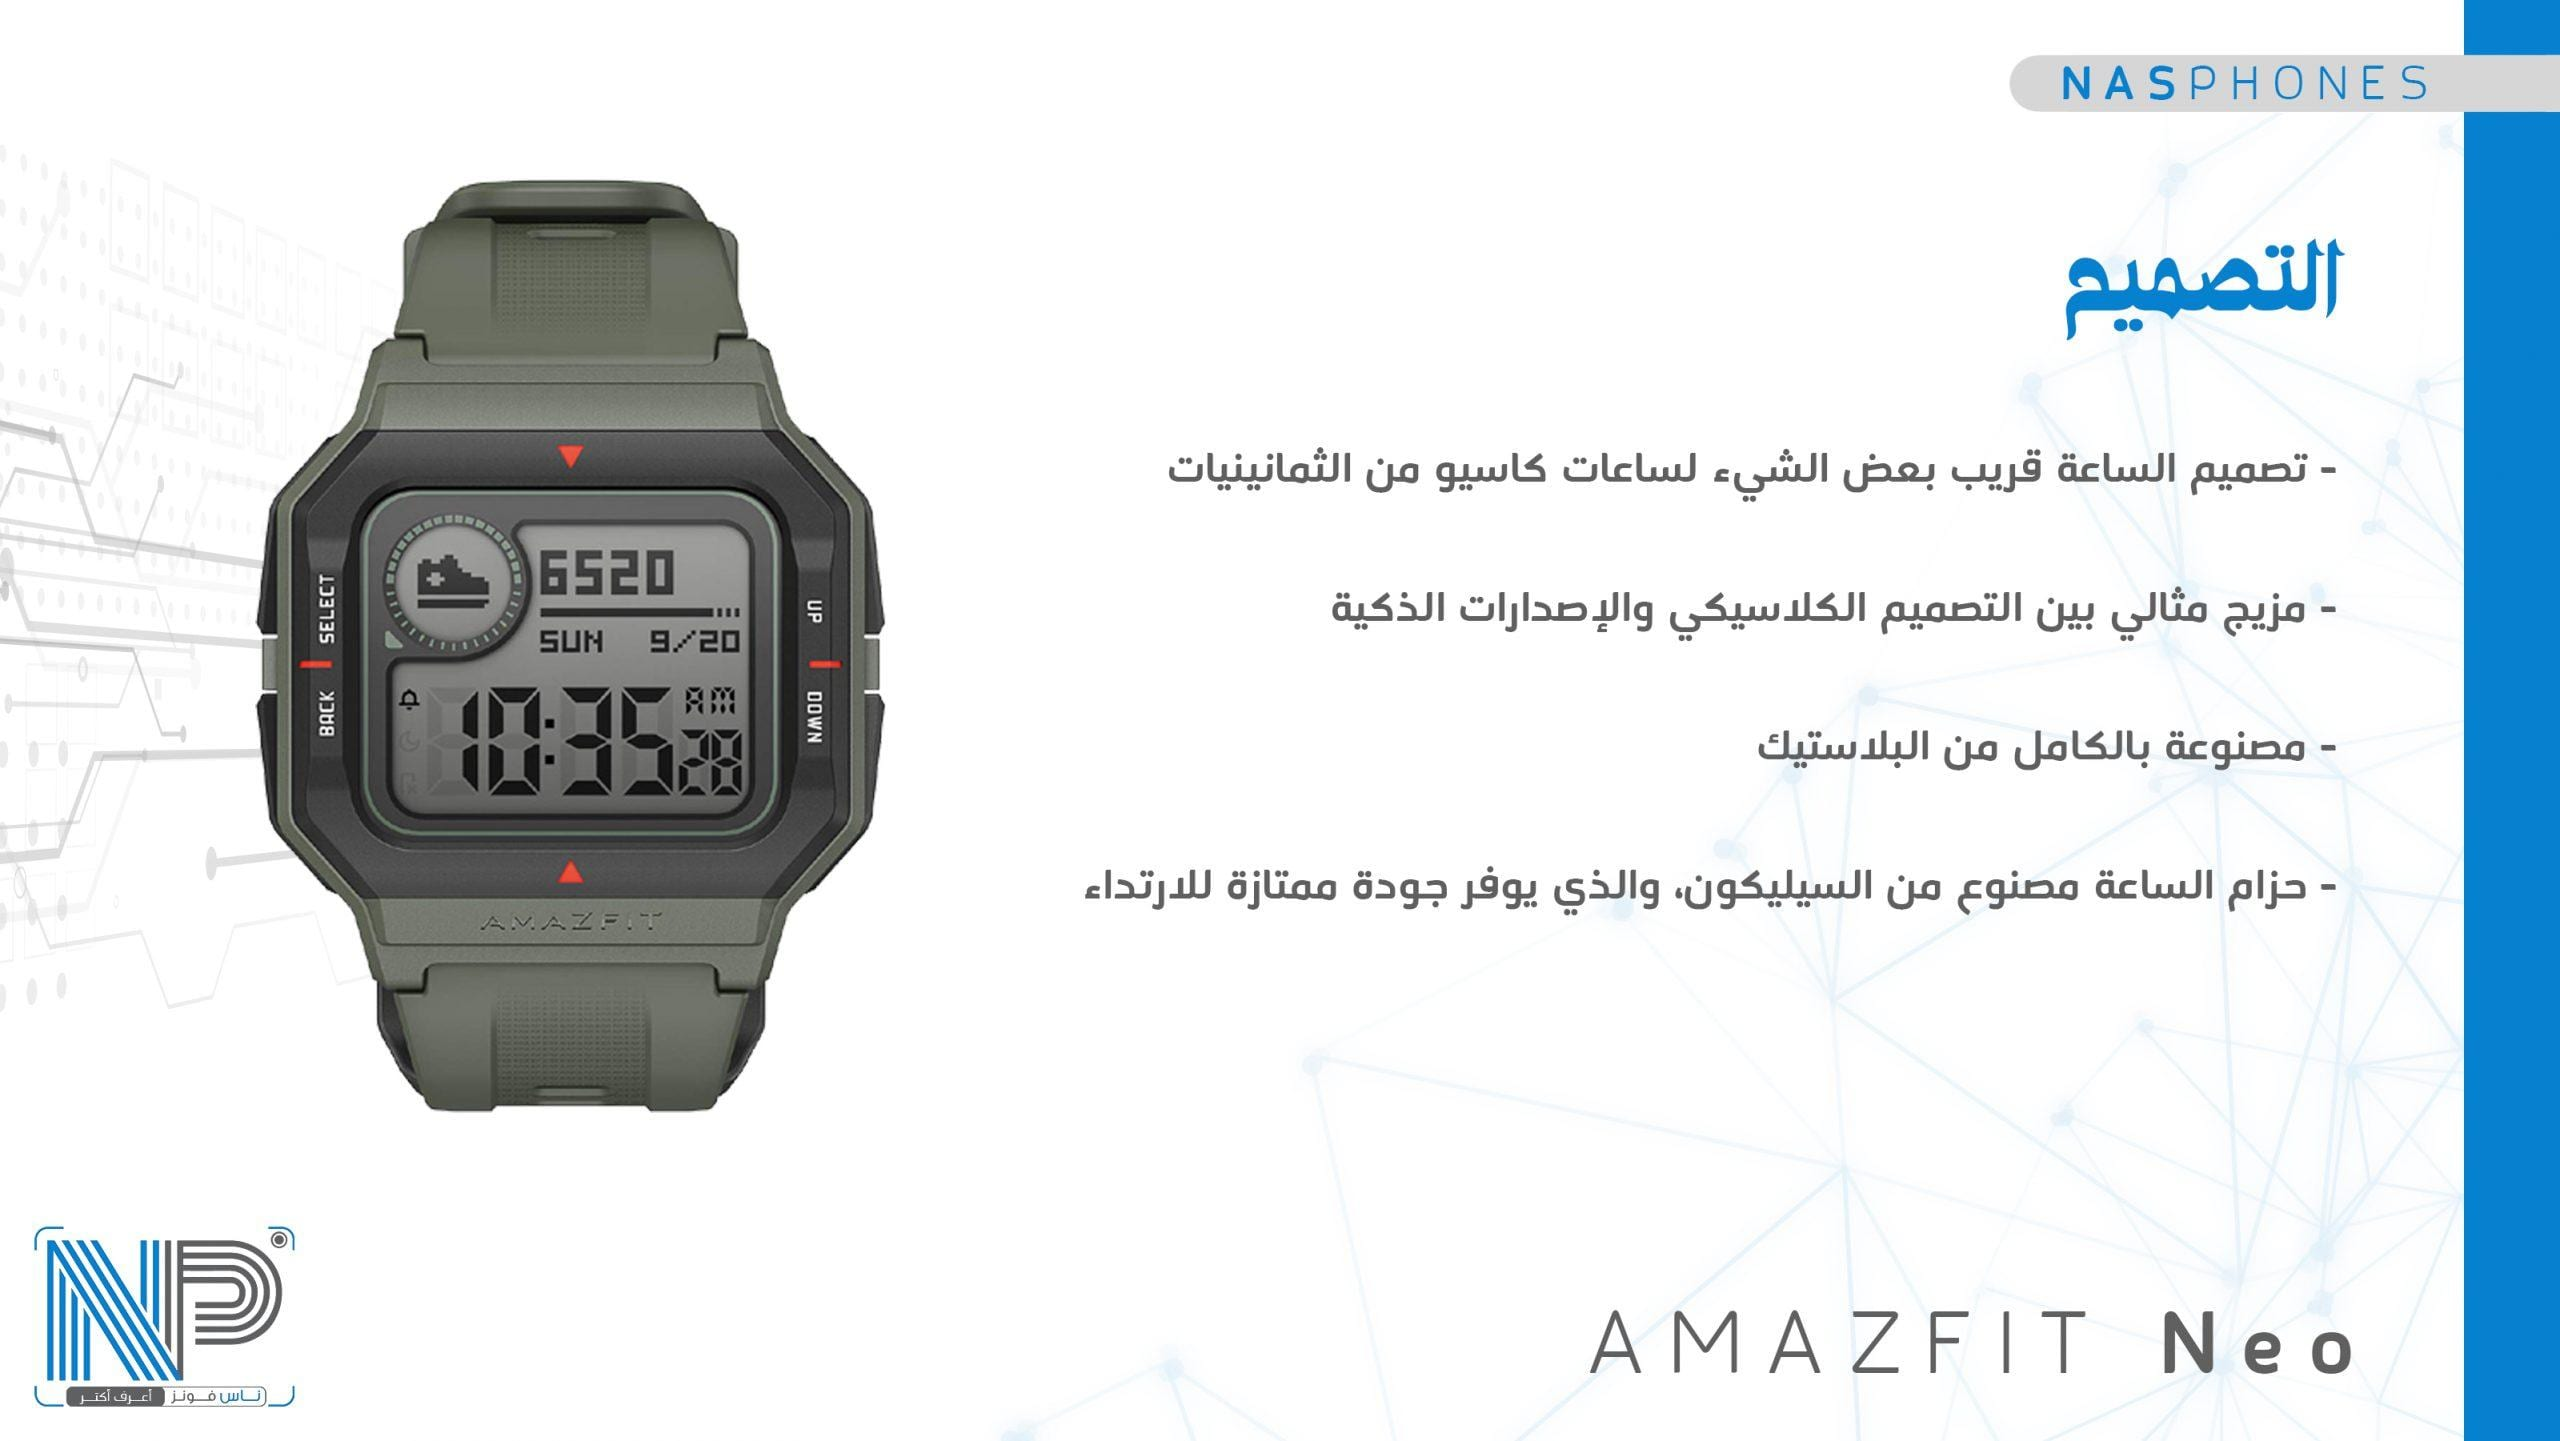 تصميم ساعة Amazfit Neo